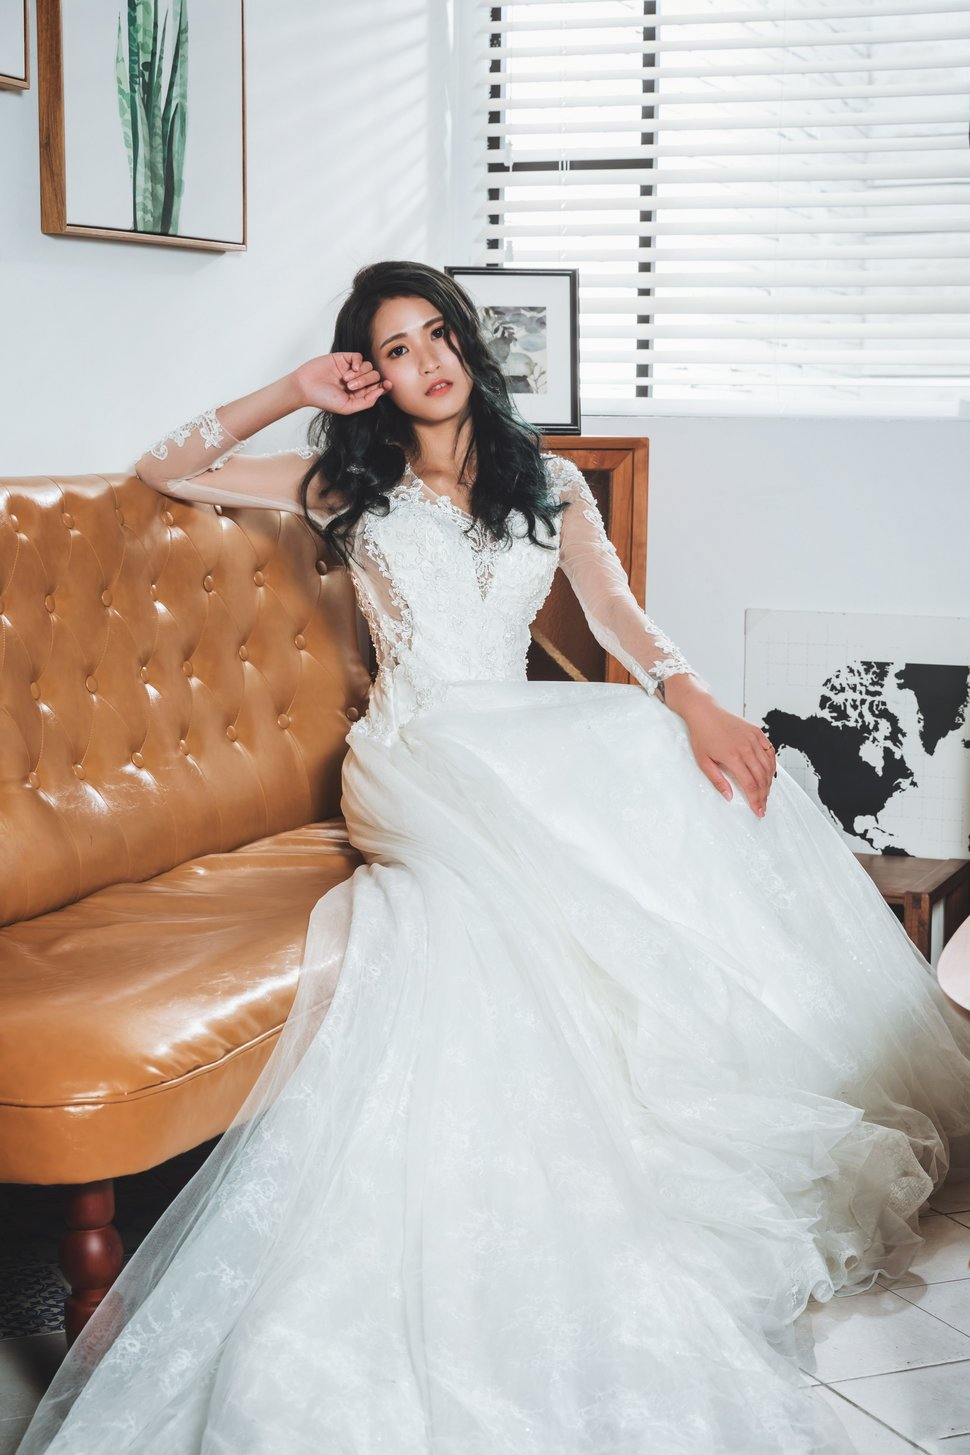 5D4_0372 - Promaker婚禮紀錄攝影團隊婚攝豪哥《結婚吧》